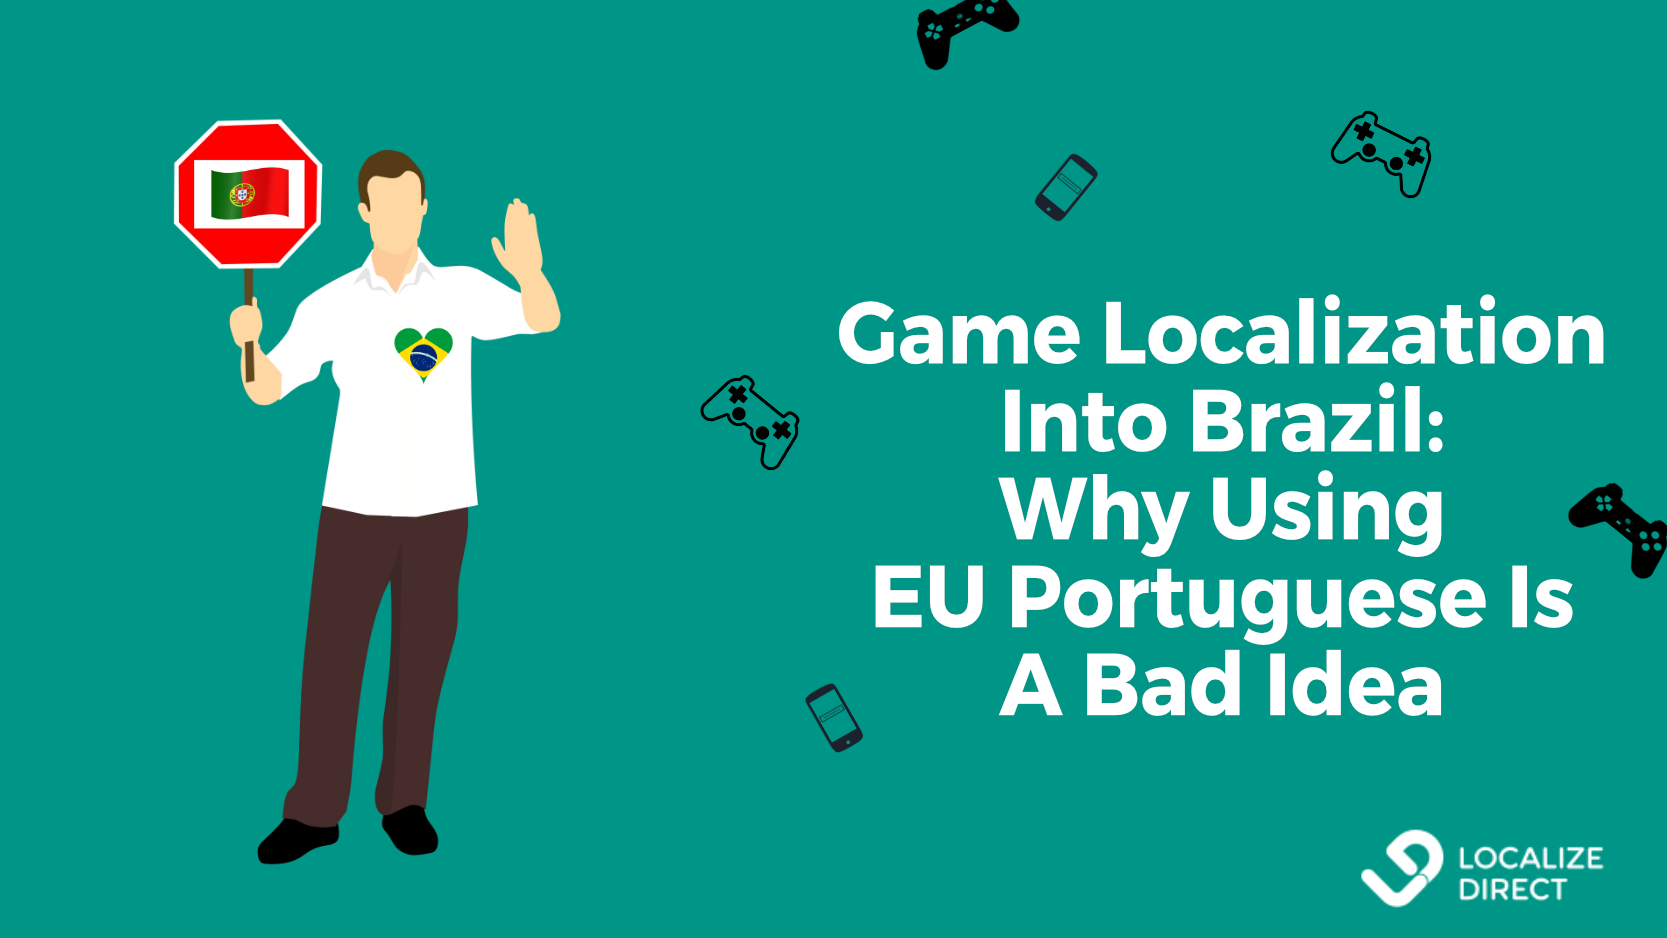 Game Localization Into Brazil: Why Using EU Portuguese Is A Bad Idea (+ factsheet)